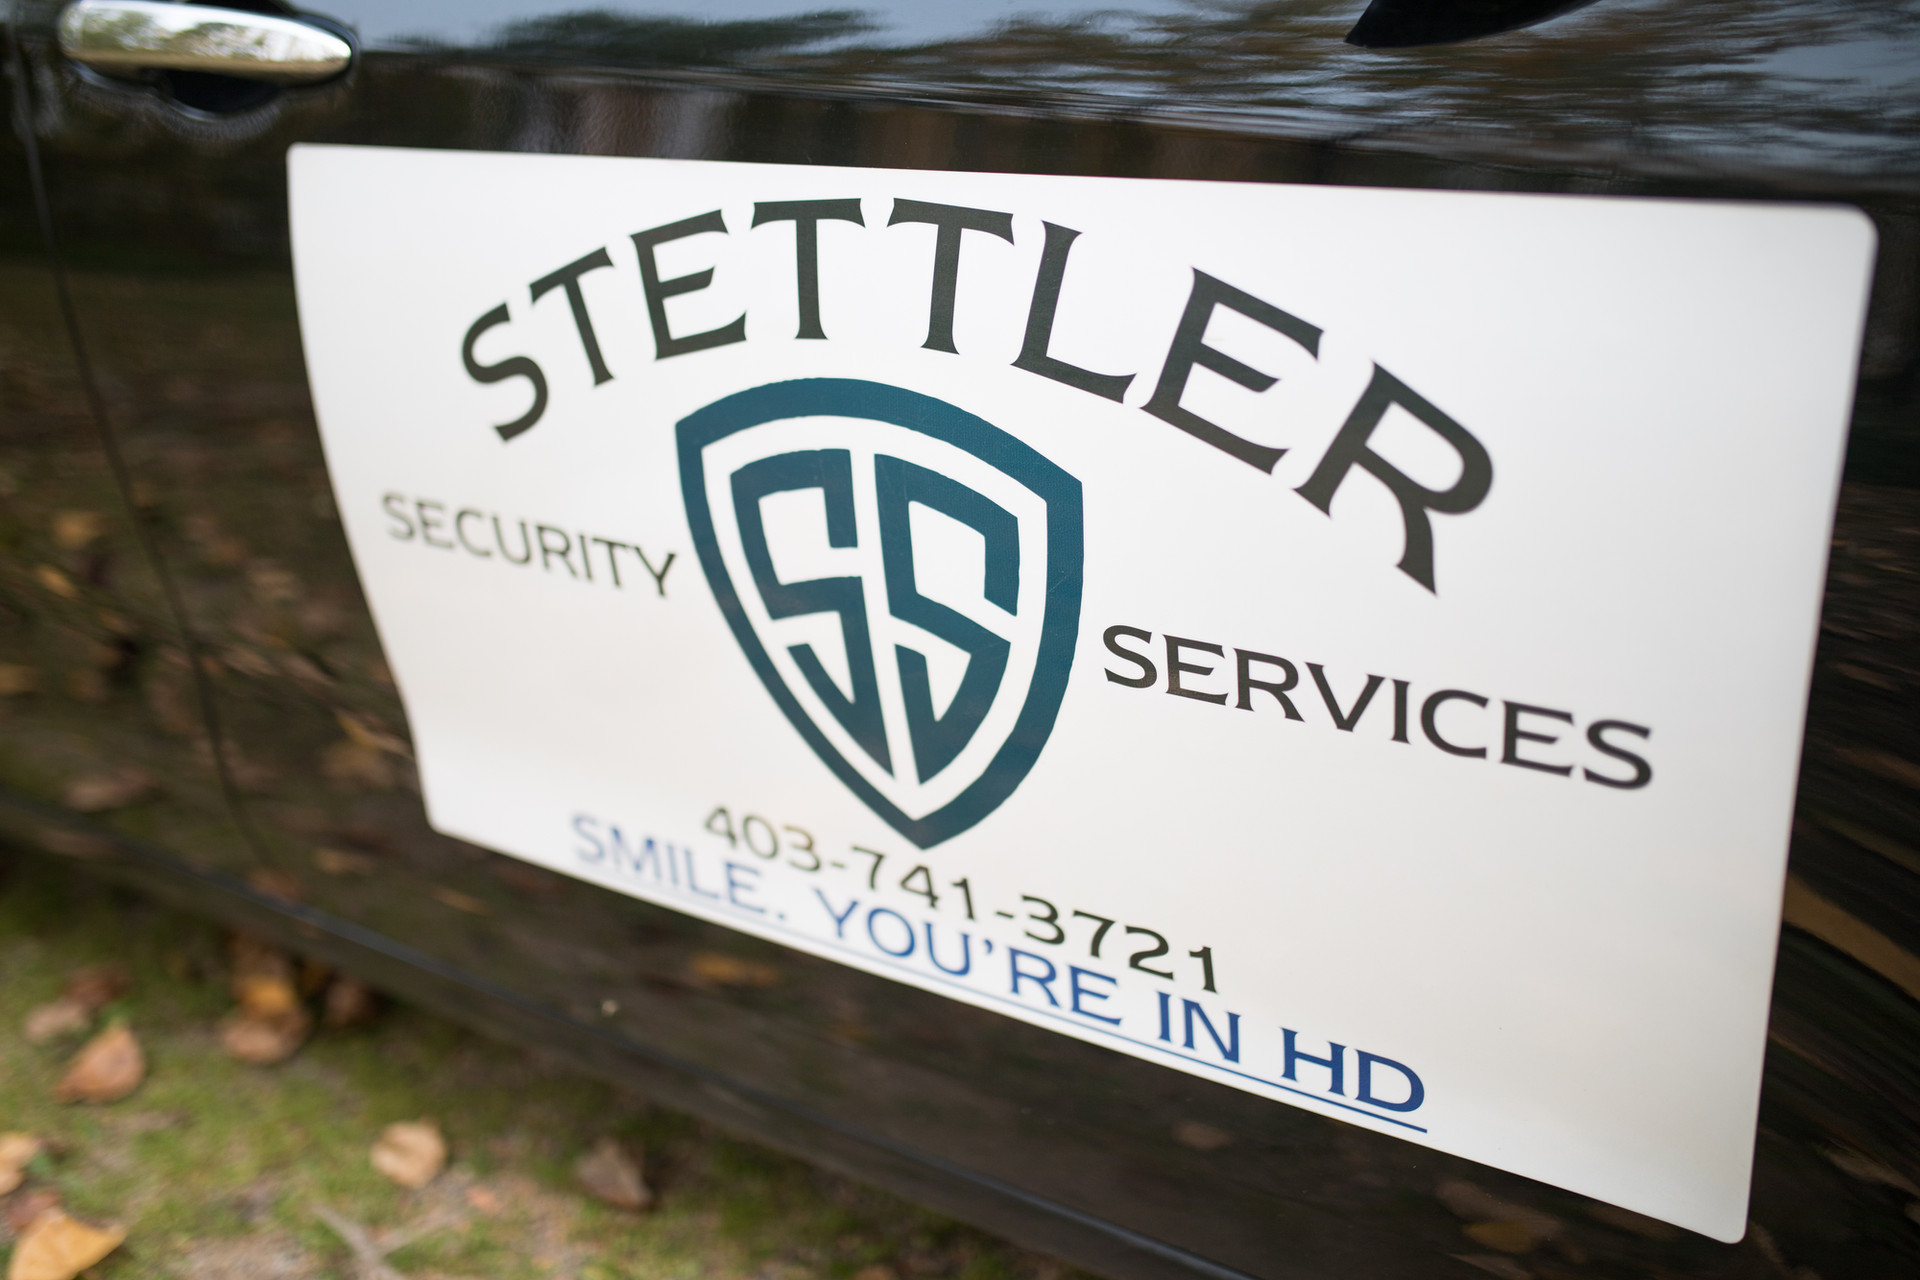 Stettler Security